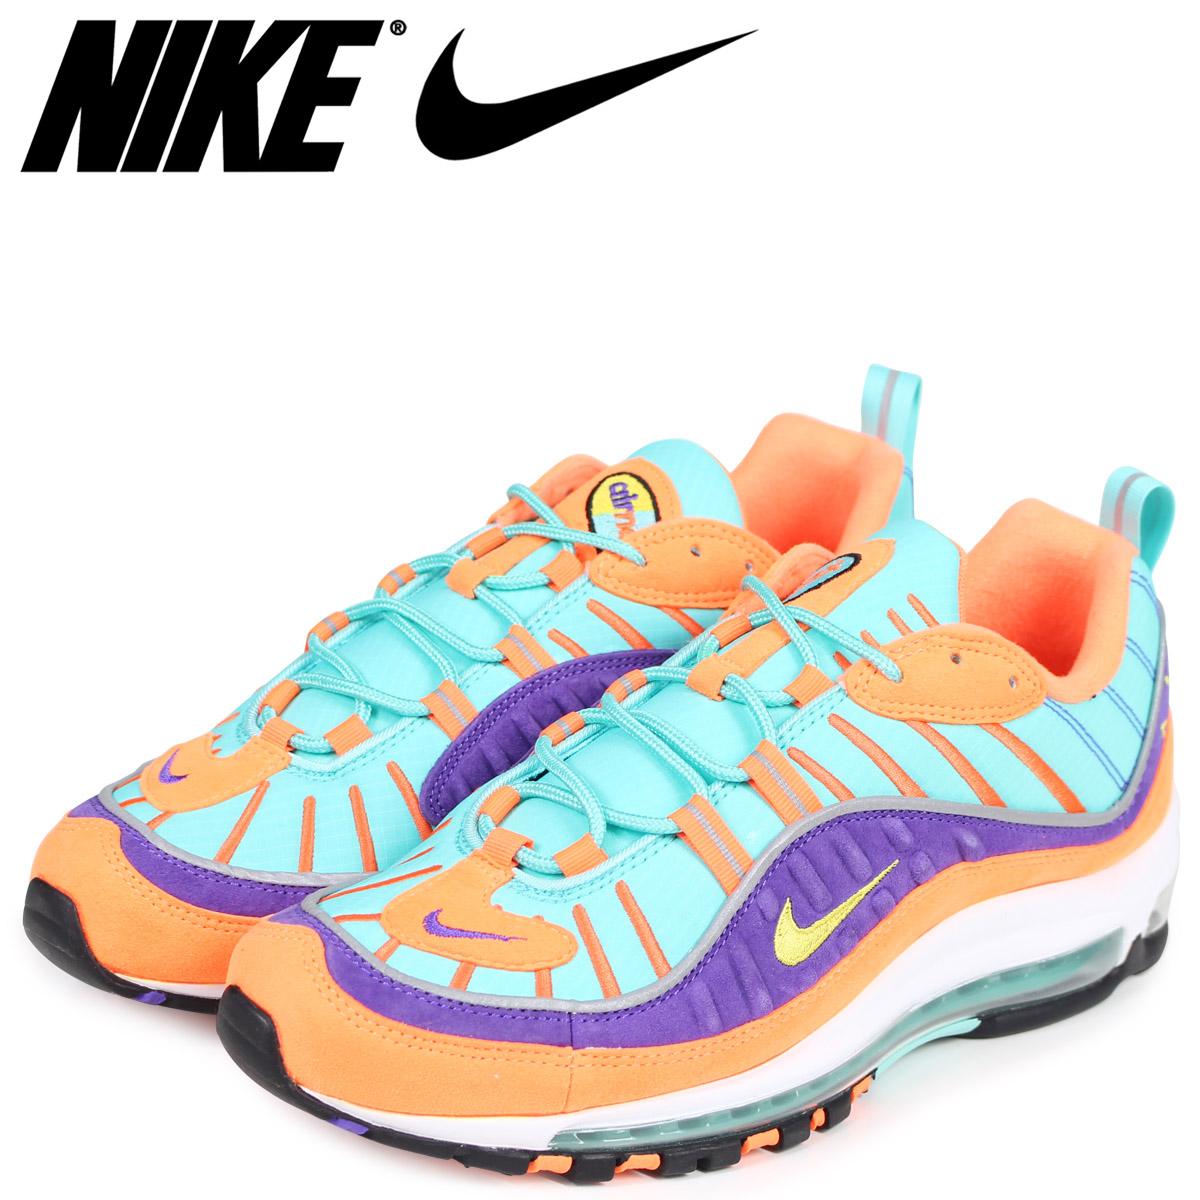 NIKE Kie Ney AMAX 98 sneakers men AIR MAX 98 QS 924,462 800 orange